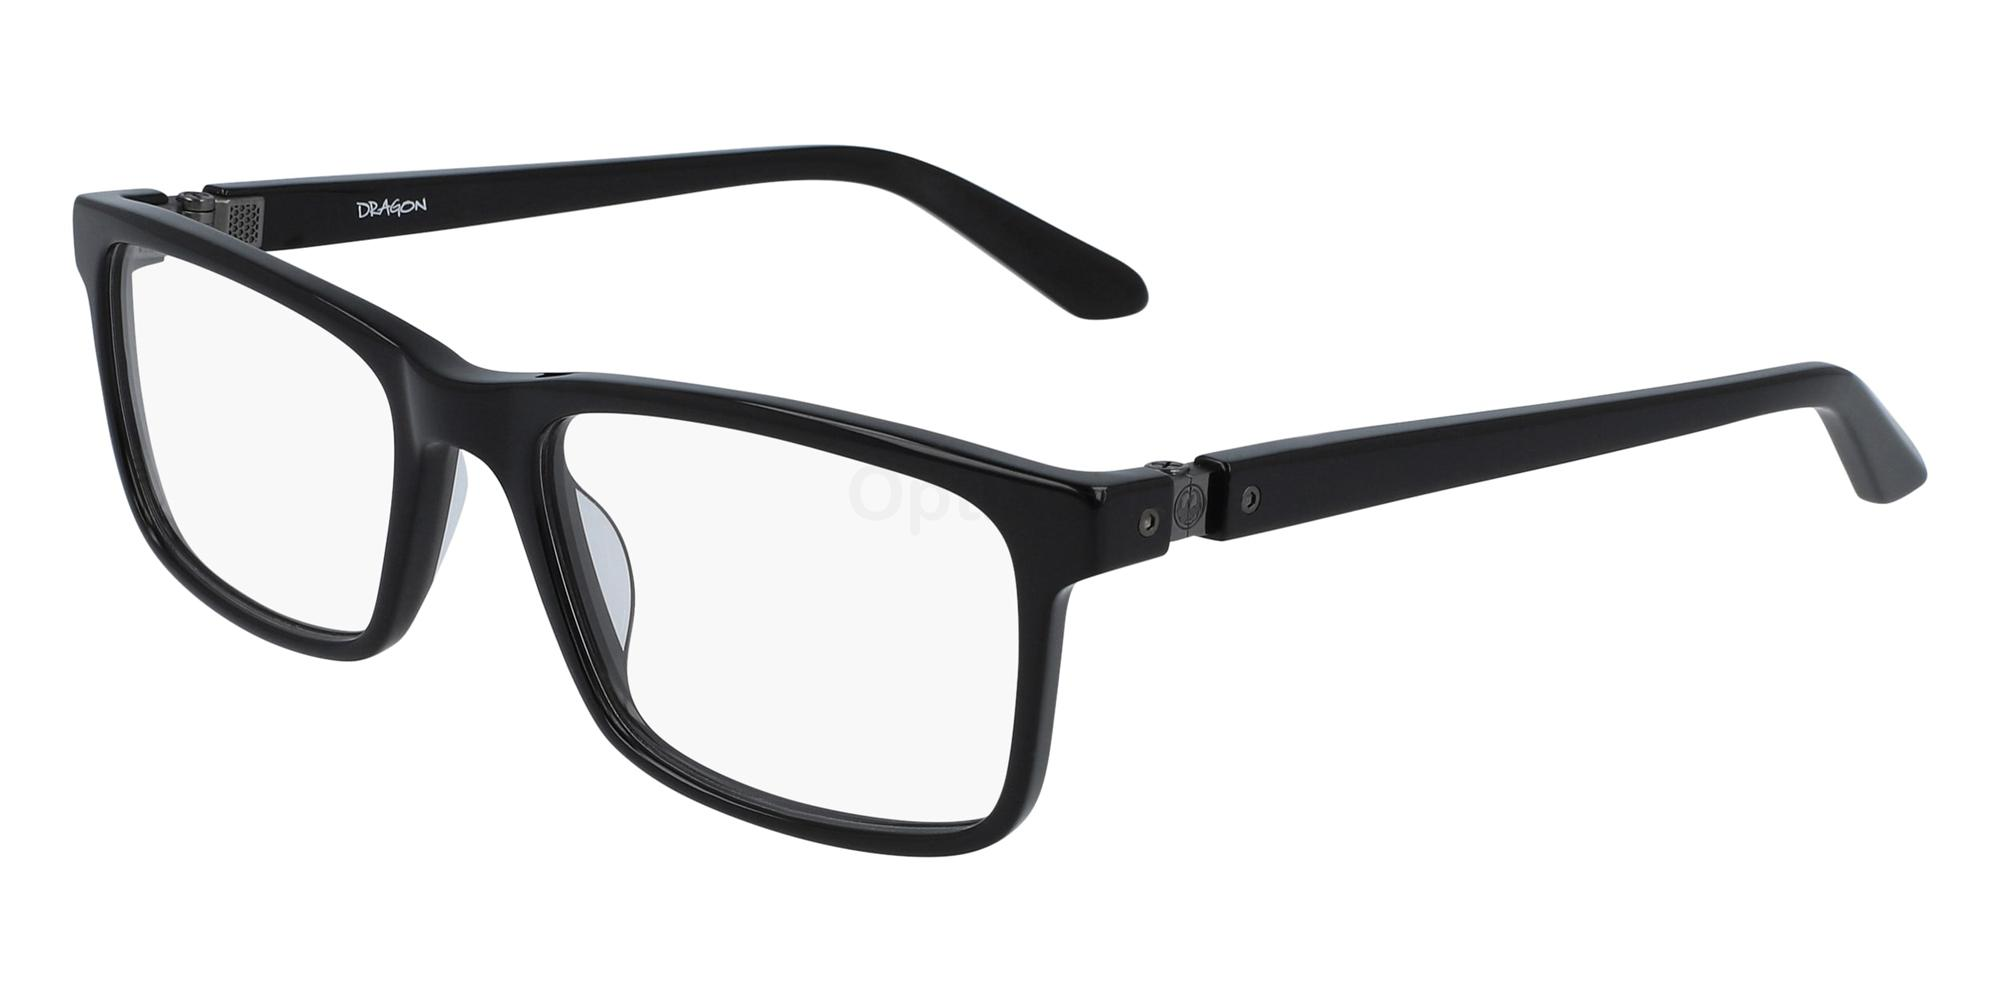 001 DR7000 Glasses, Dragon